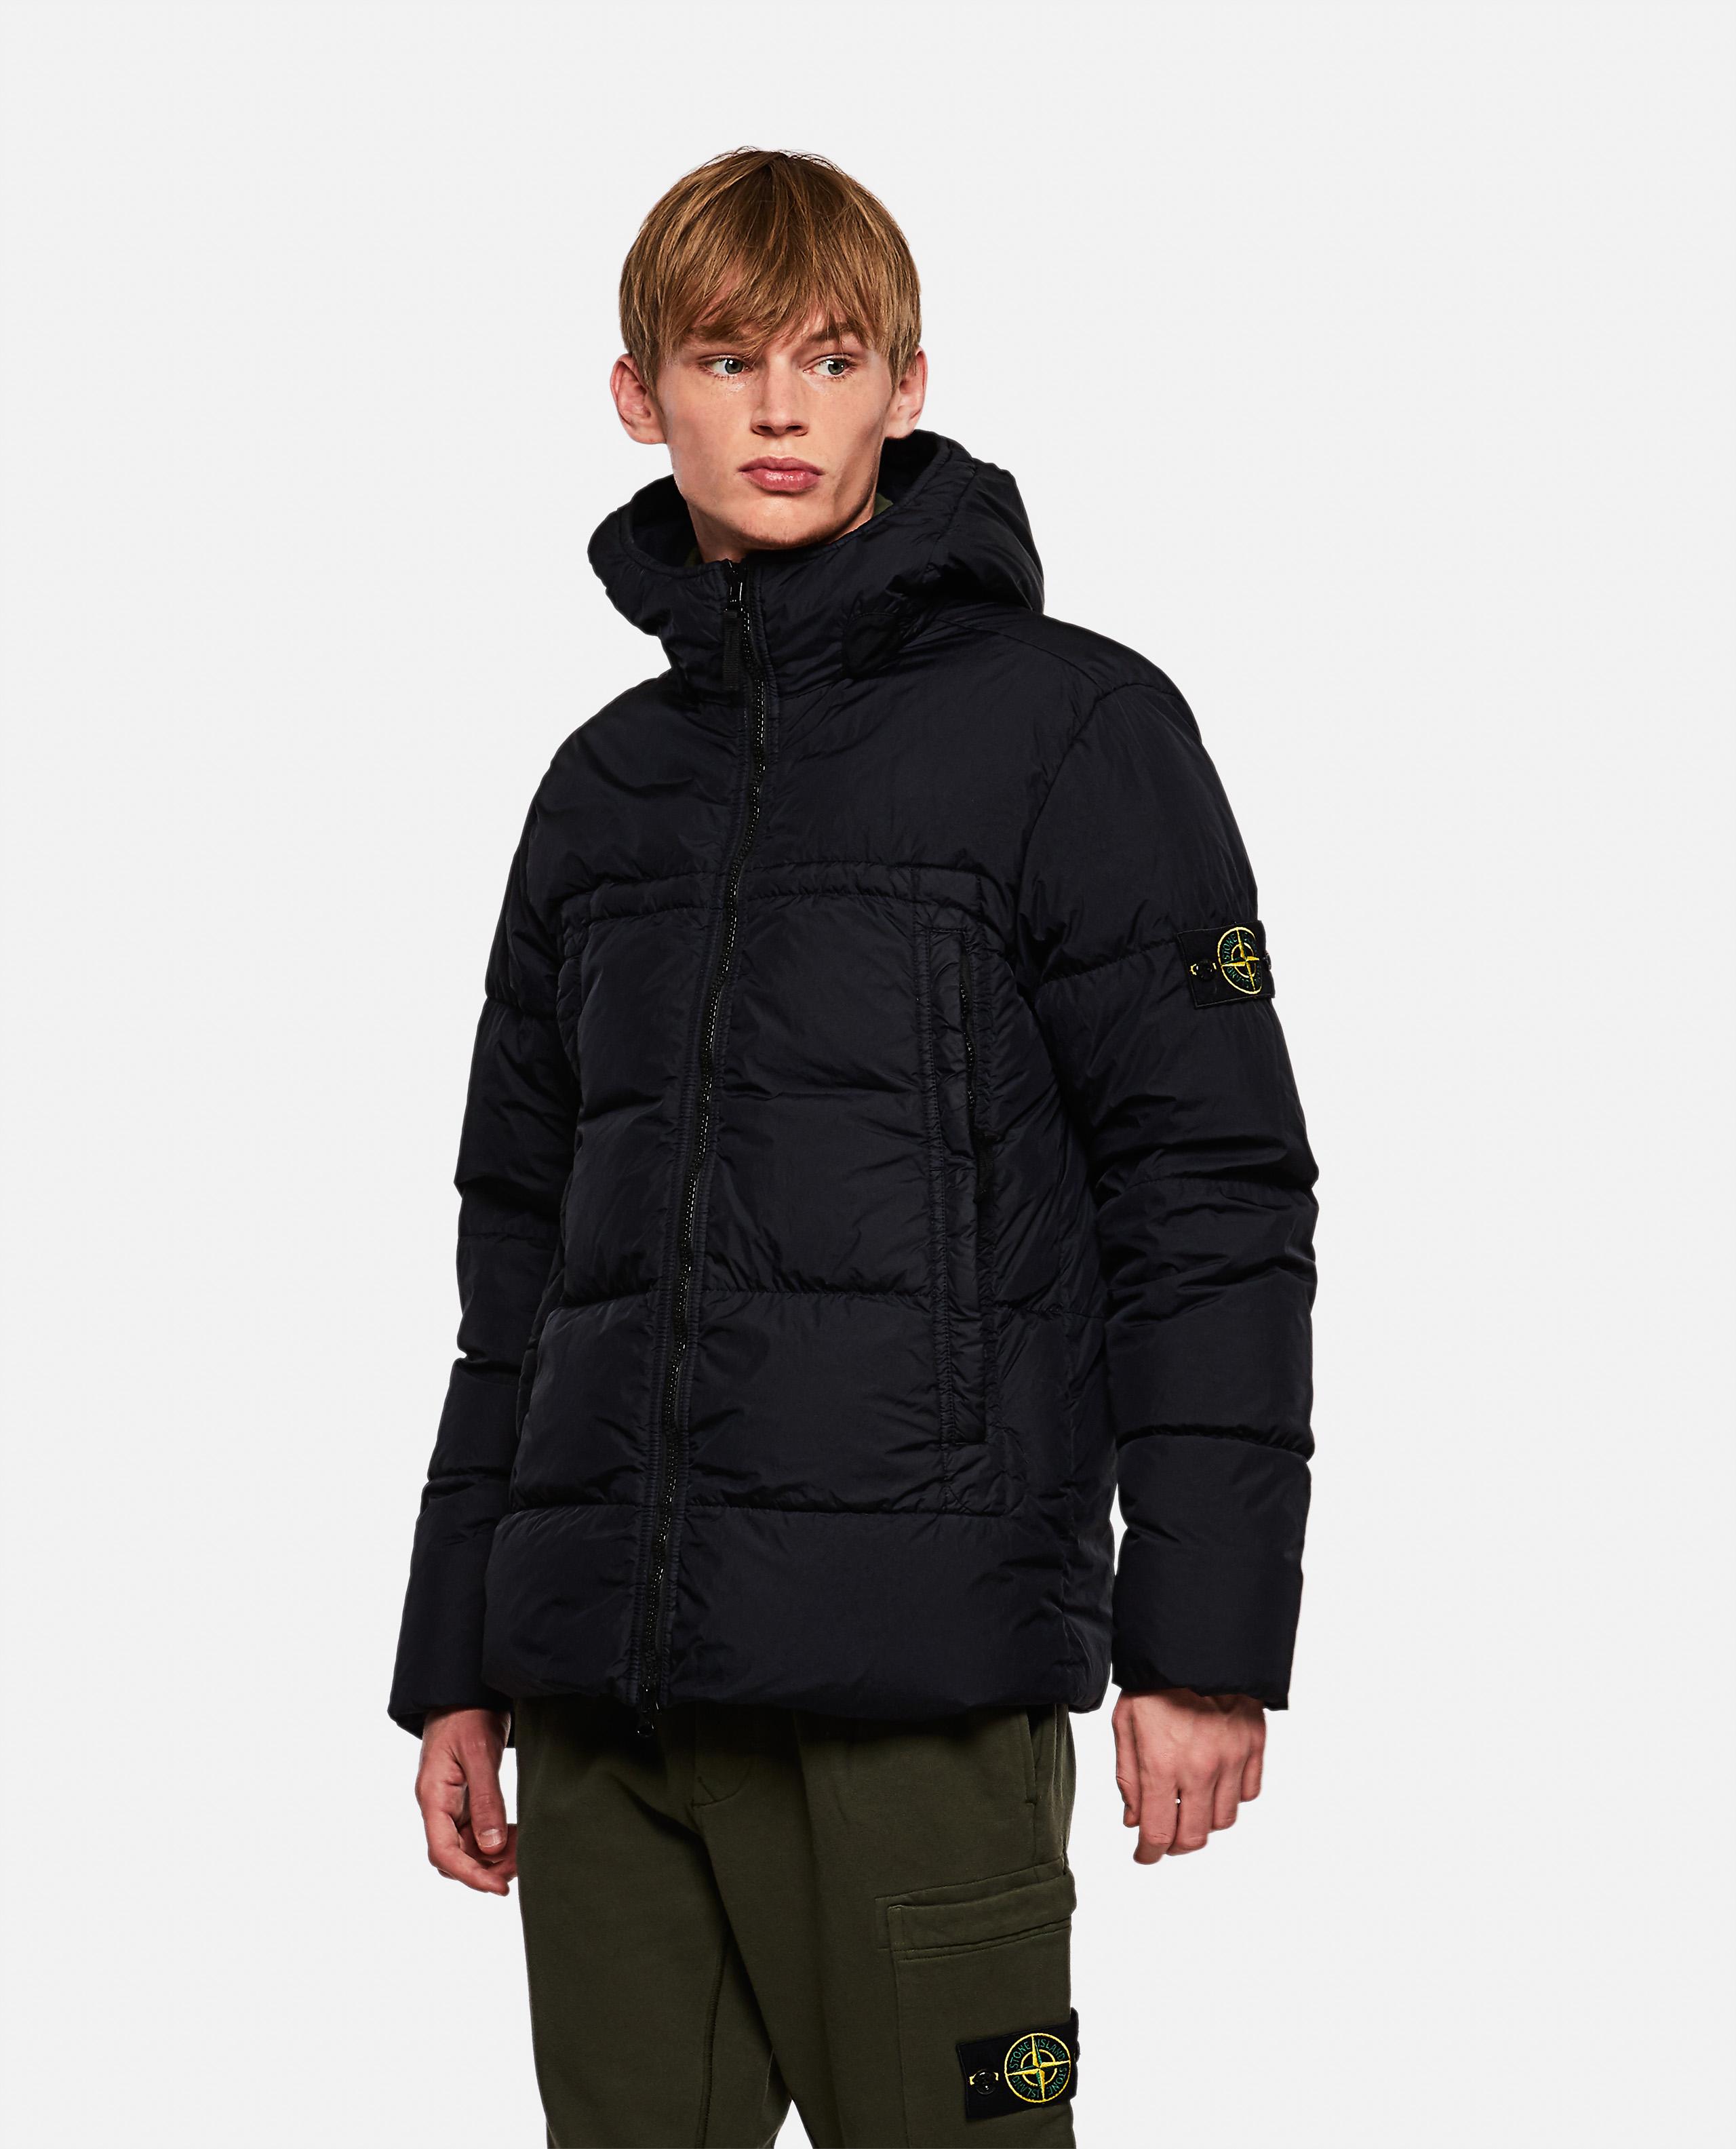 GD Crinkle Reps down jacket